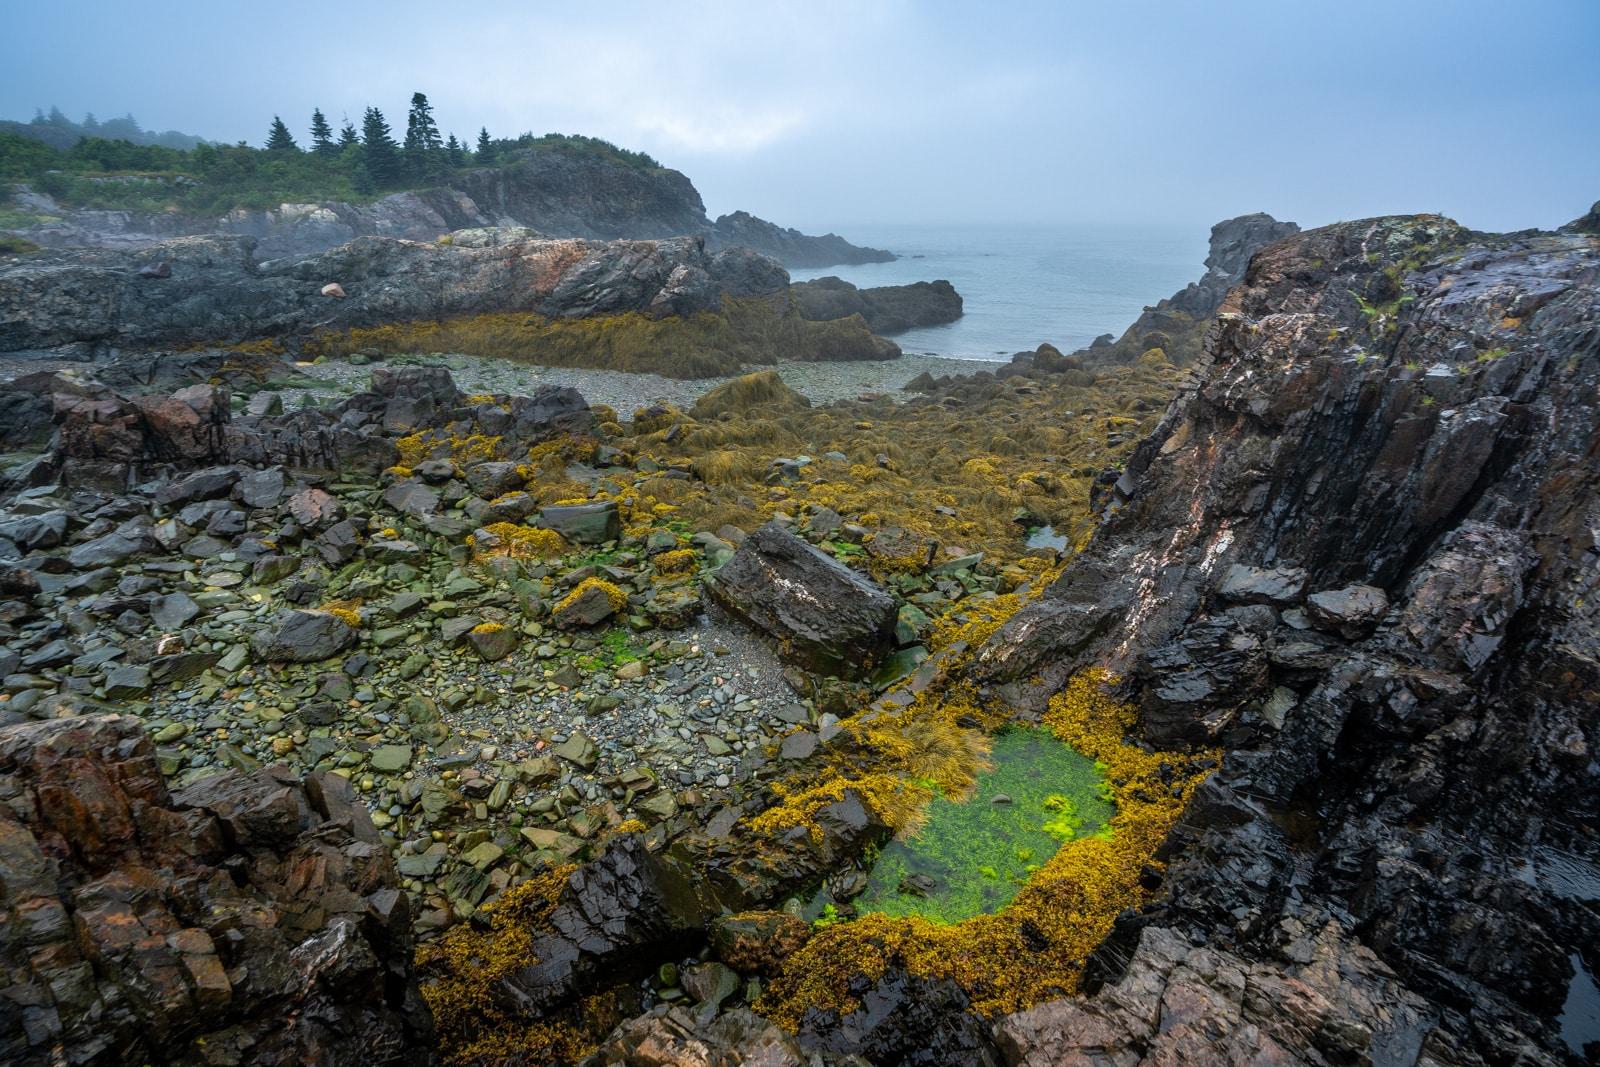 Moody weather on the Bold Coast shoreline near Lubec, Maine